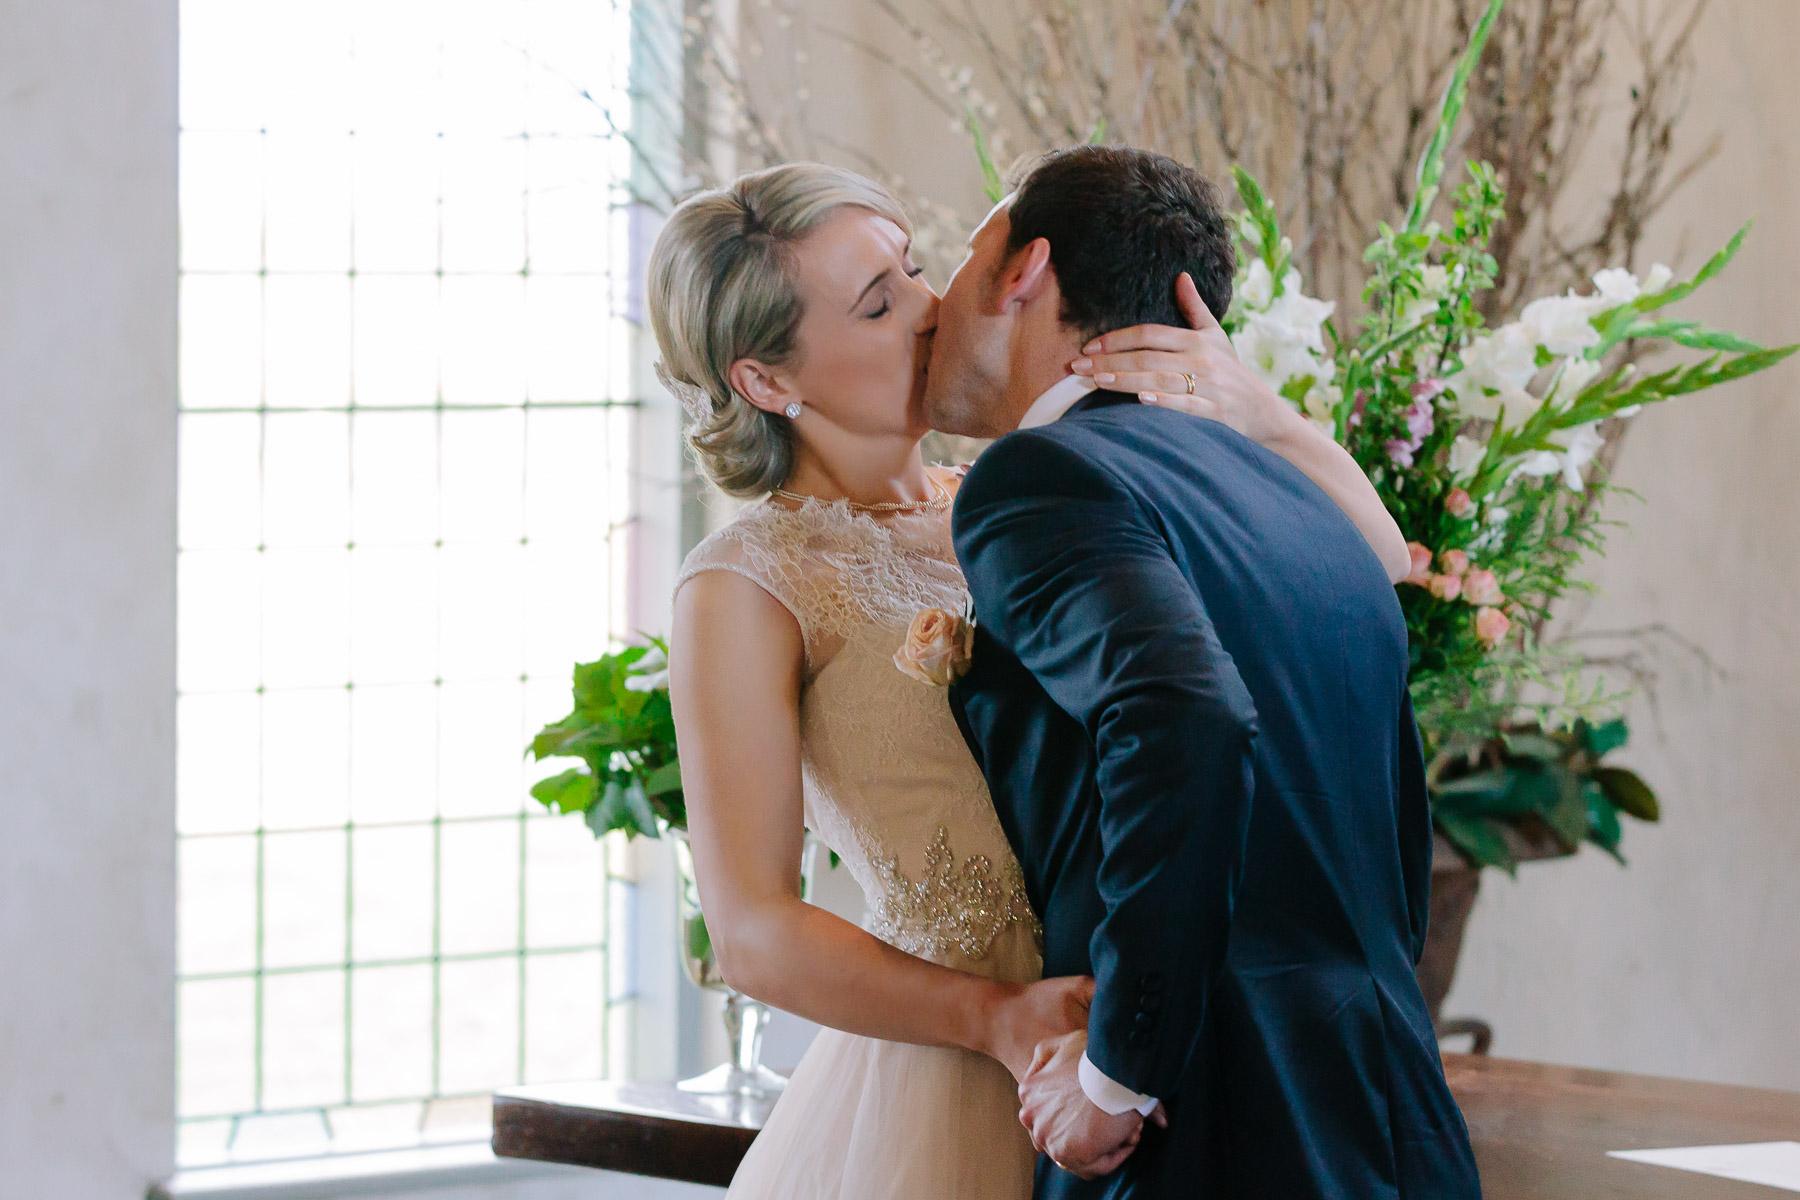 Marnie_and_Charlie_Yarra_Valley_Wedding_Blog-49.jpg